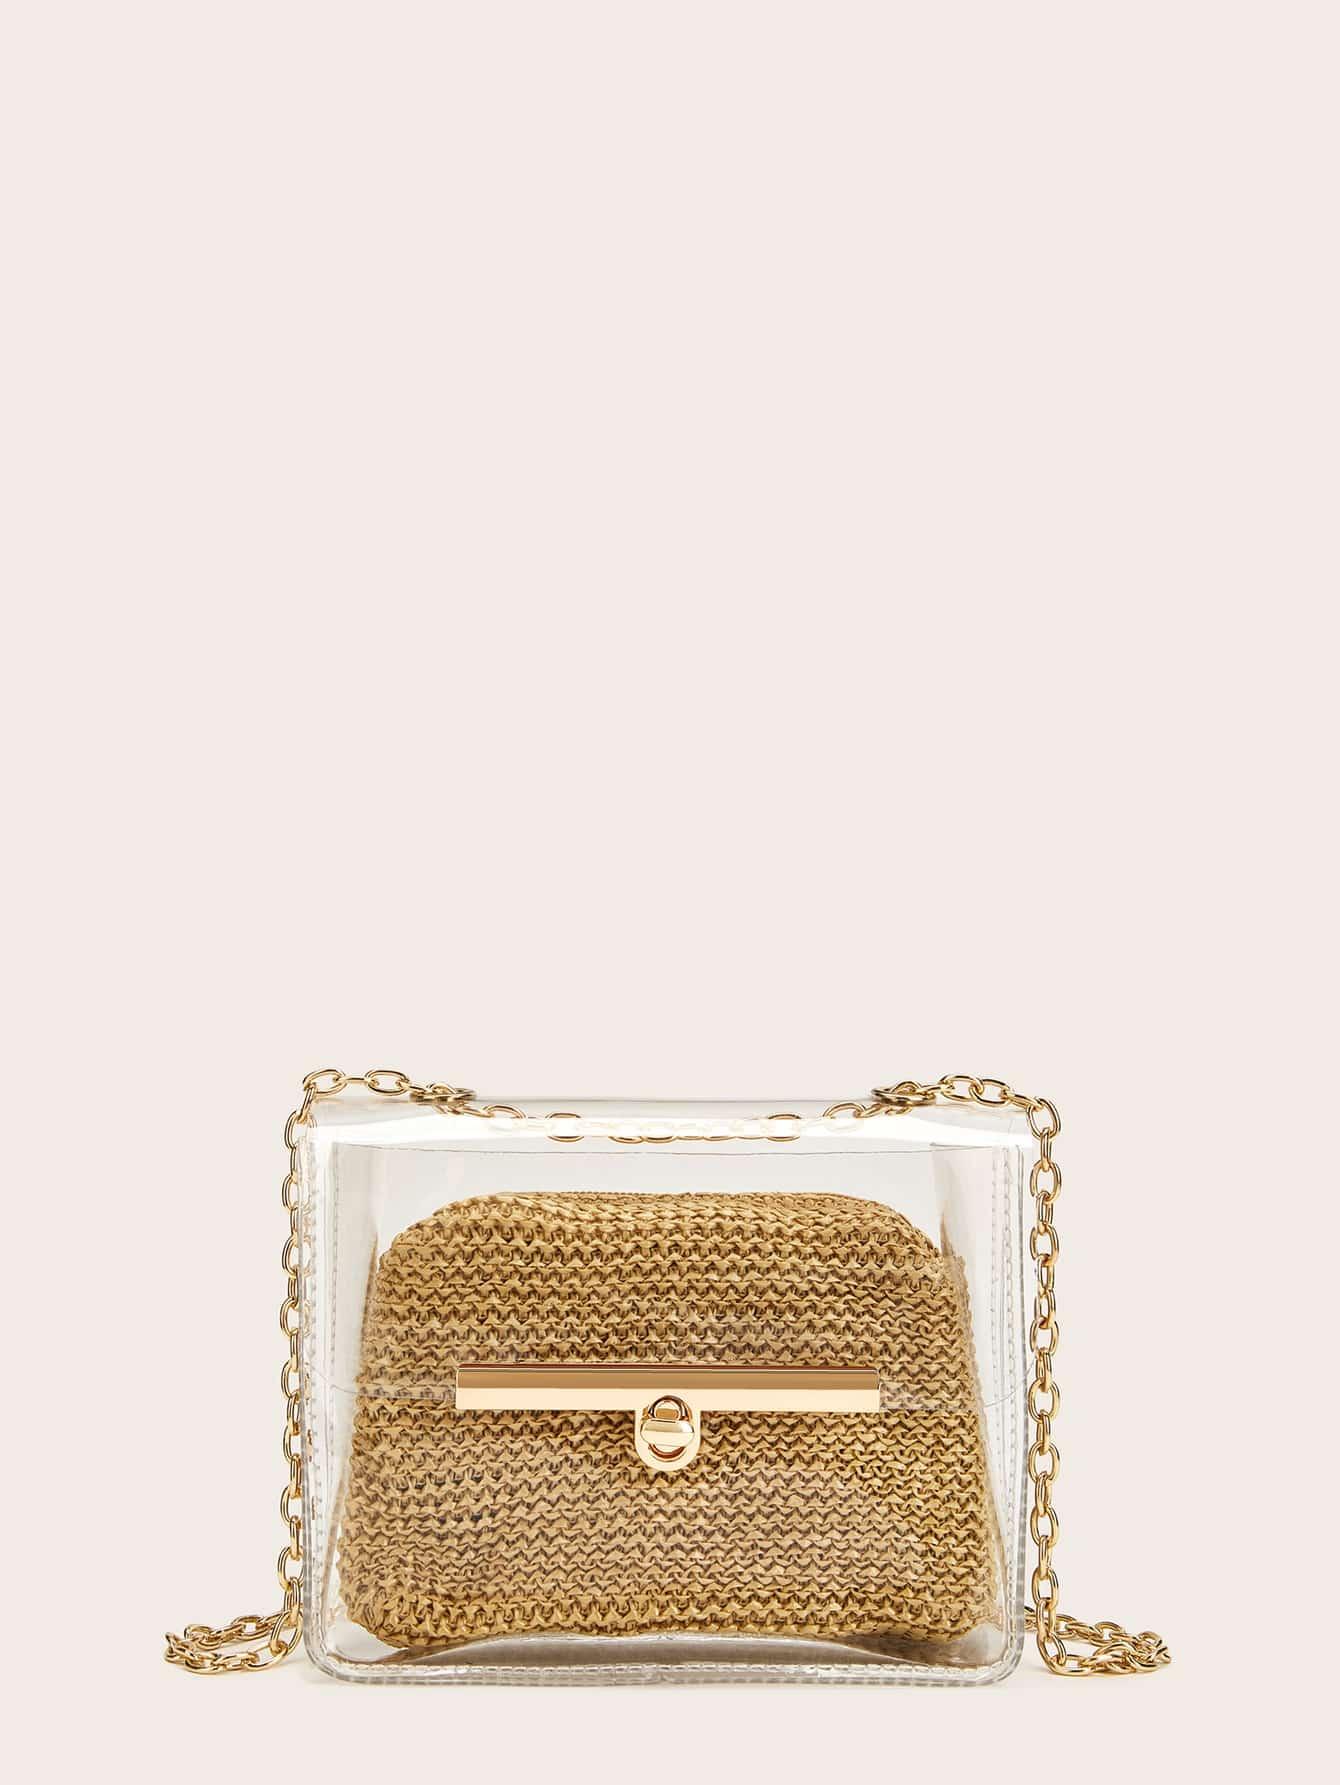 Фото - Прозрачная сумка через плечо с цепочкой от SheIn цвета хаки